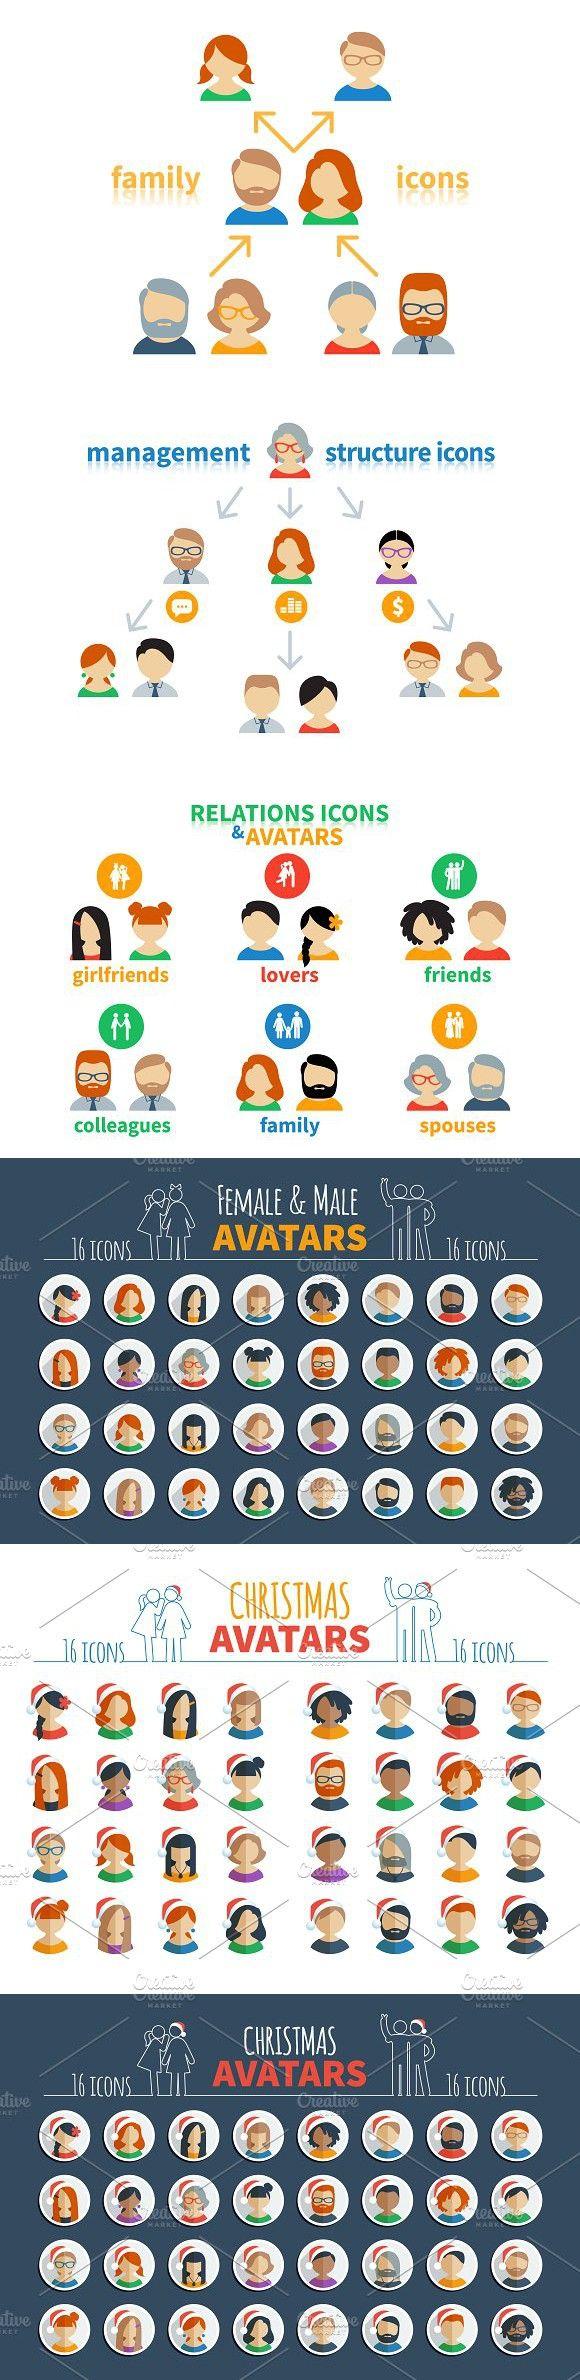 Male and female avatars   Xmas bonus. Graphic Design Infographics #network #friend